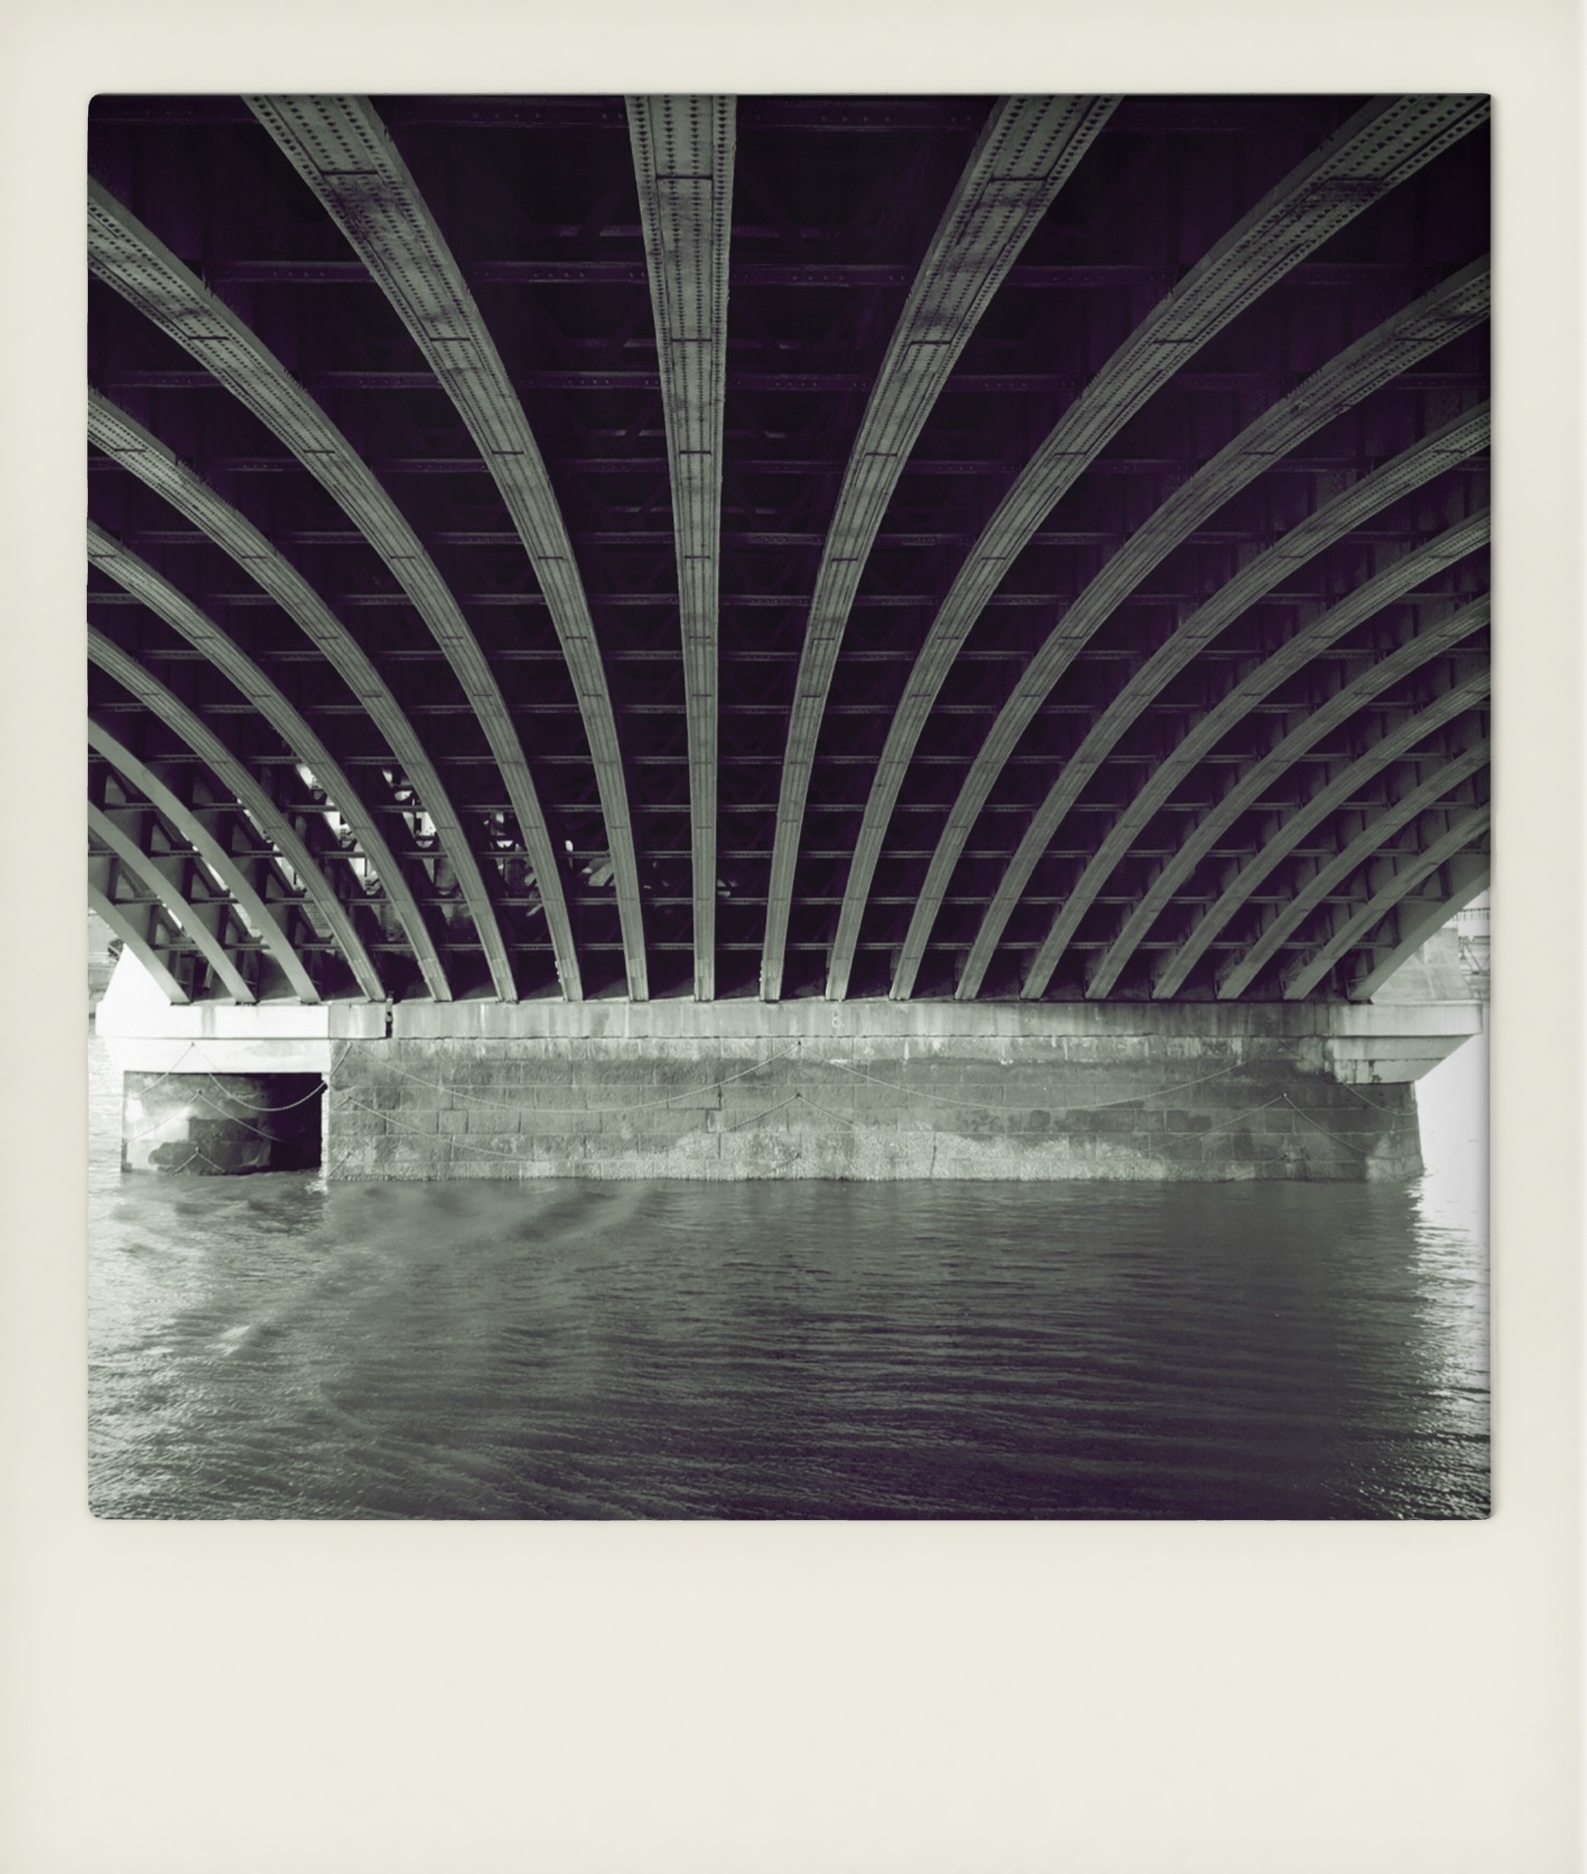 Blackfriars Bridge, Viewed Sout - phil_levene   ello